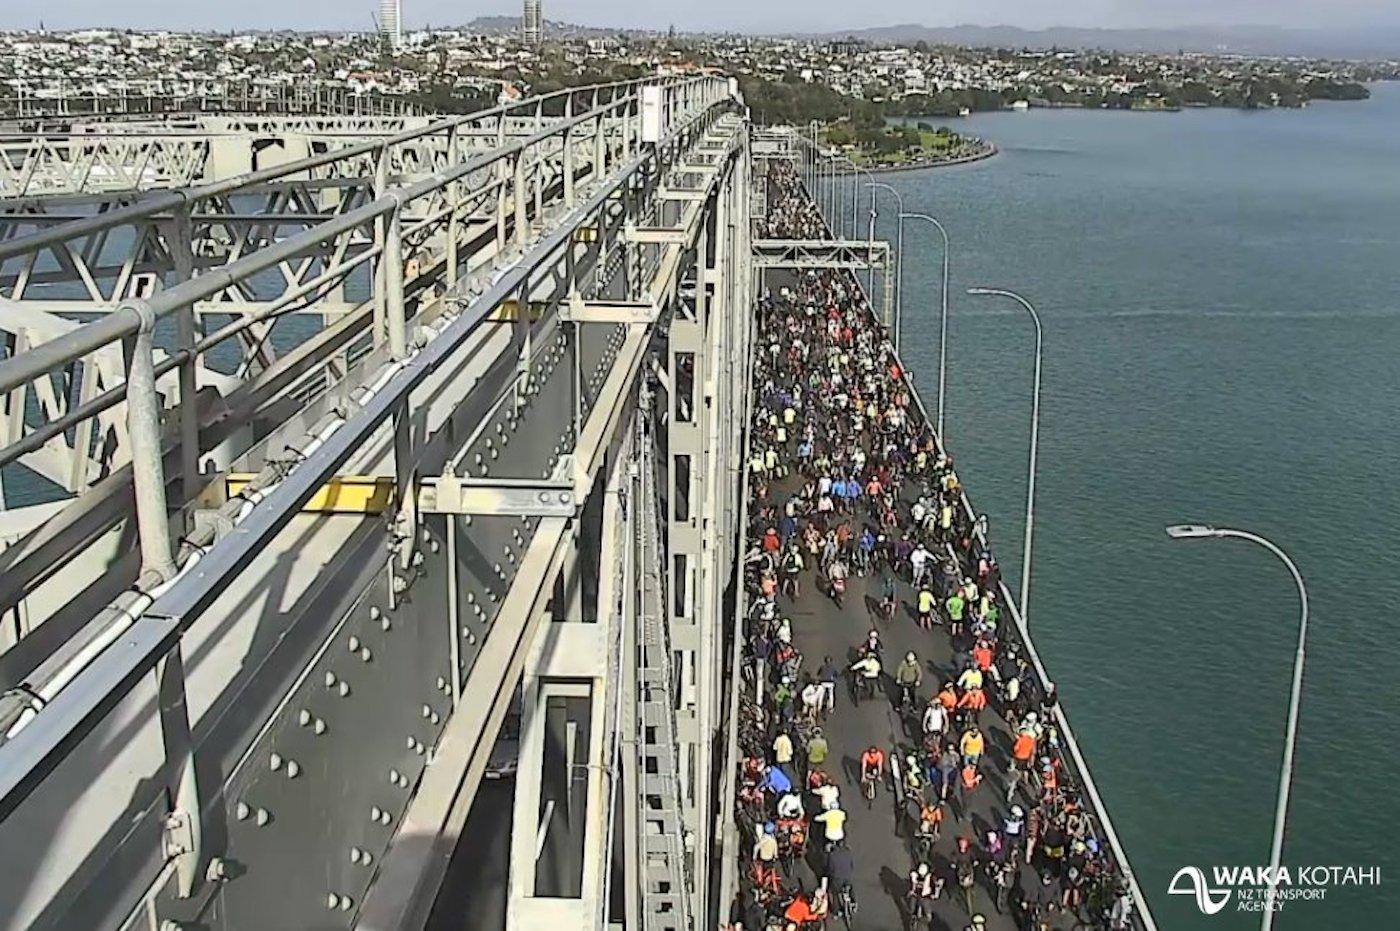 Selfish Road Maggots Cause Mayhem on Harbour Bridge